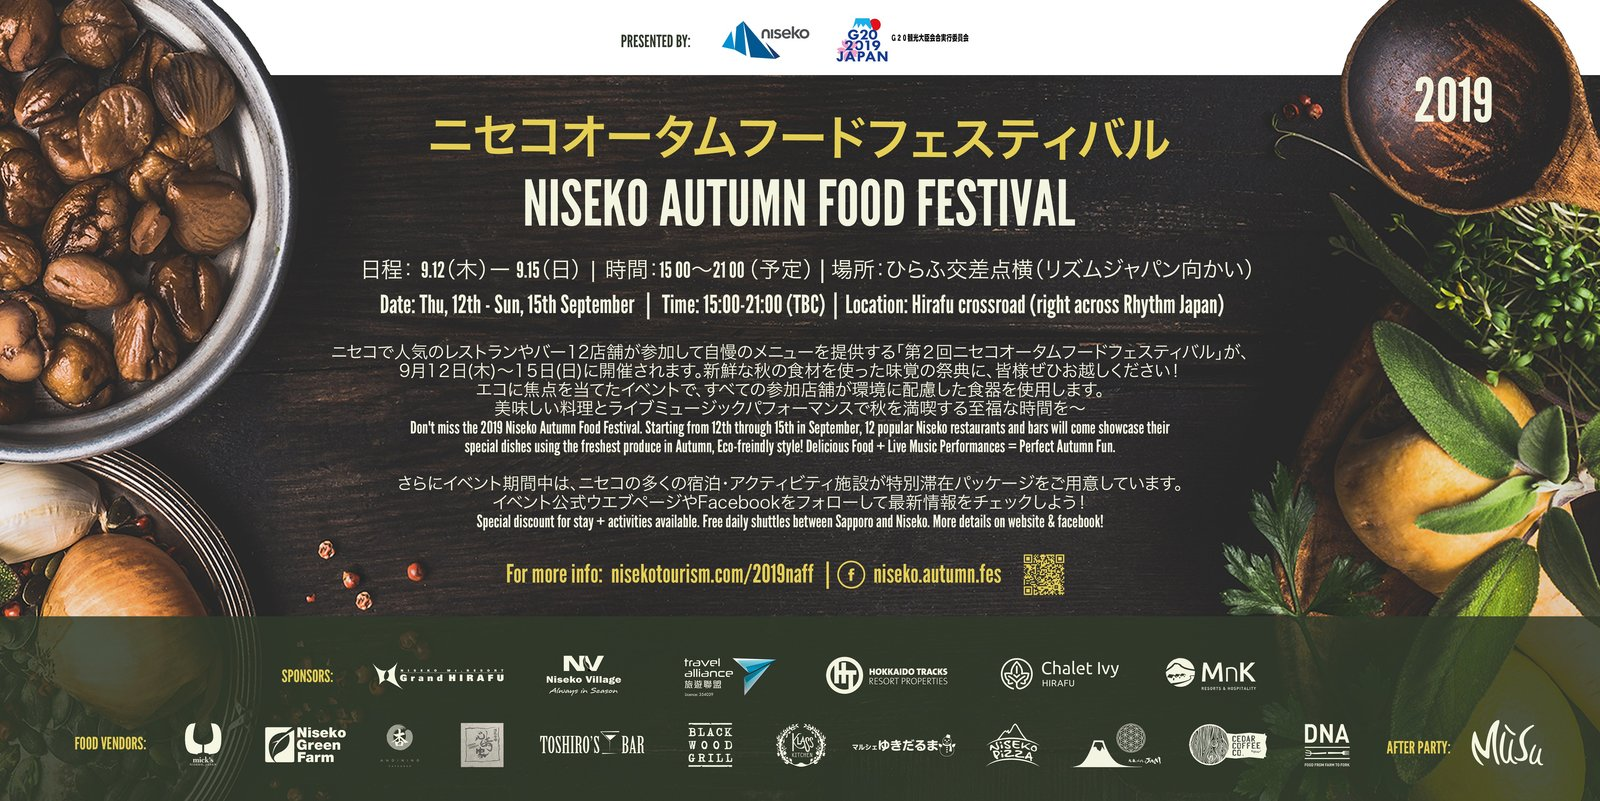 Niseko Autumn Food Festival 2019